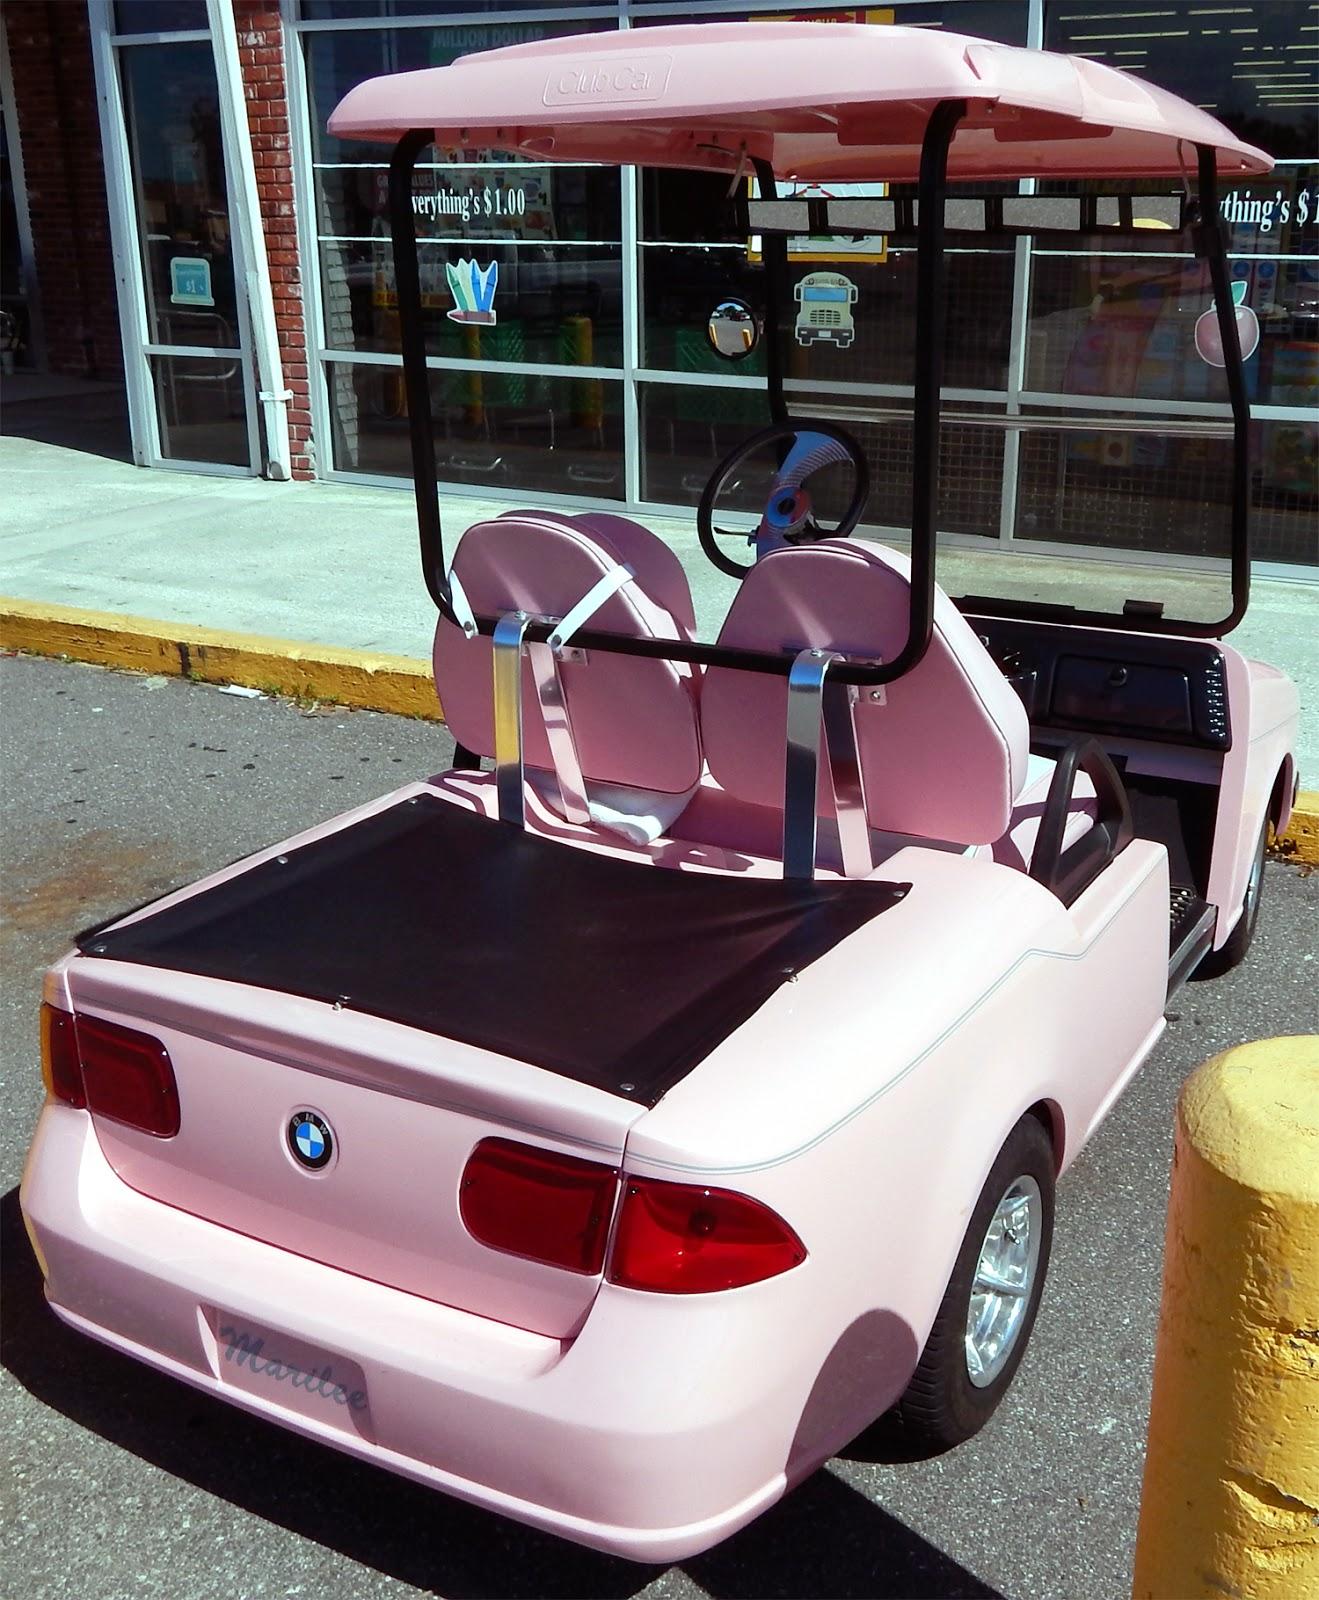 Pink Mary Kay BMW Club Car golf cart, Sun City Center Plaza Bmw Golf Cart Kit on garden cart kits, trailer kits, construction kits, go cart lift kits, golf carts vehicle, log splitter kits, bar stool cart kits, atv kits, parts kits, go cart light kits, golf pull carts clearance, golf carts like trucks, golf decorating ideas, hot tub kits, dune buggy kits, club cart lift kits, camper kits, air compressor kits, wheel kits, chopper kits,